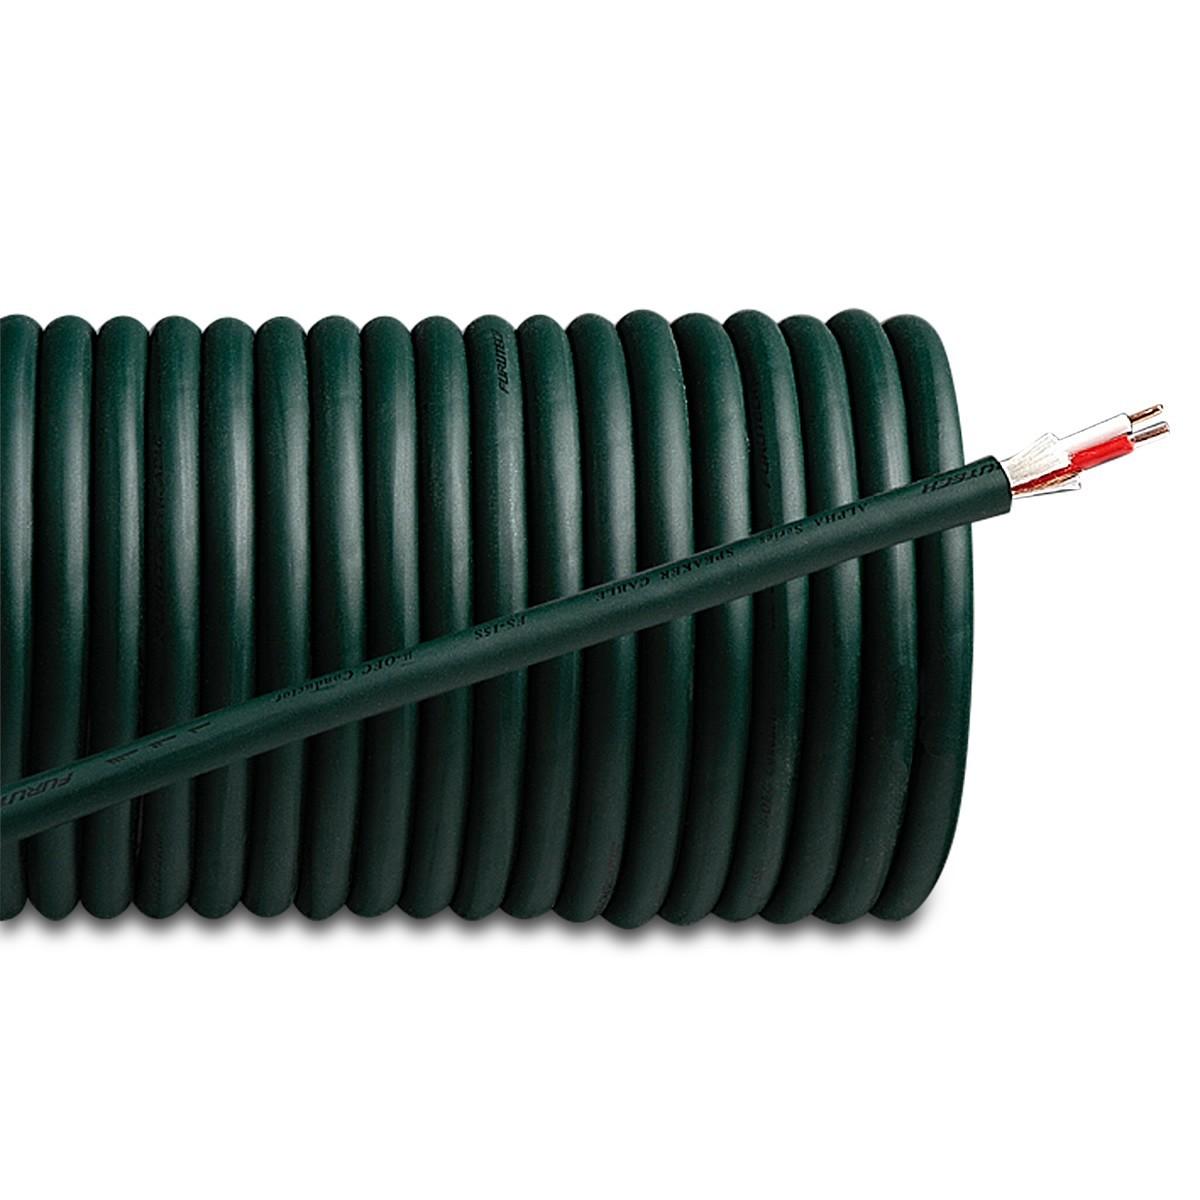 FURUTECH FS-15S Câble HP Cuivre OFC (SolidCore Alpha) 2x1.6mm² Ø8.2mm